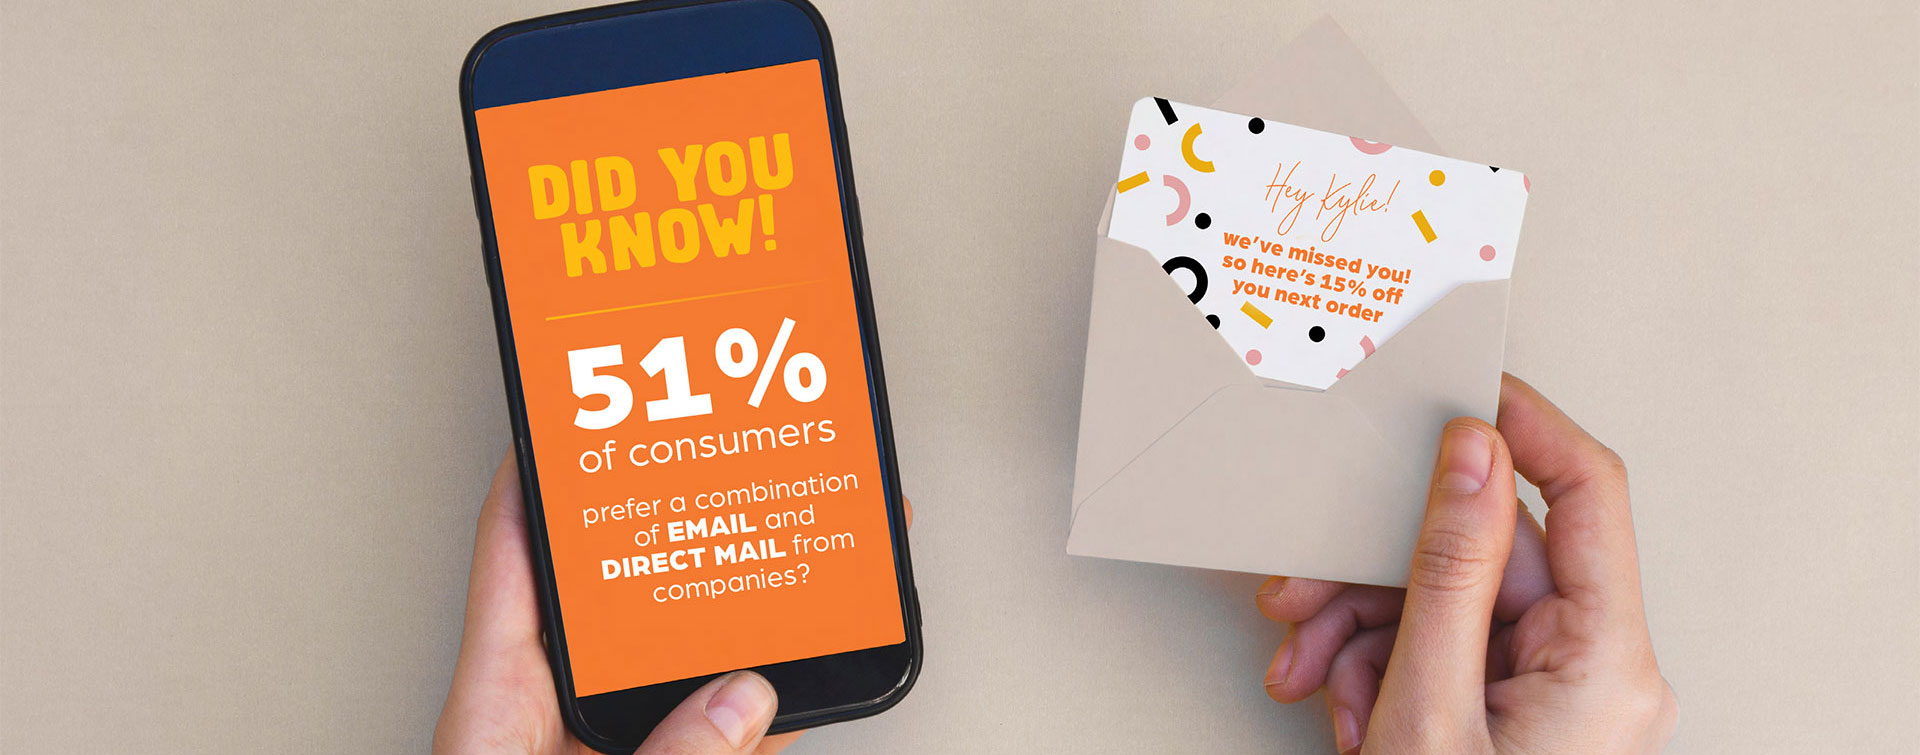 digital direct marketing on mobile phone and envelope